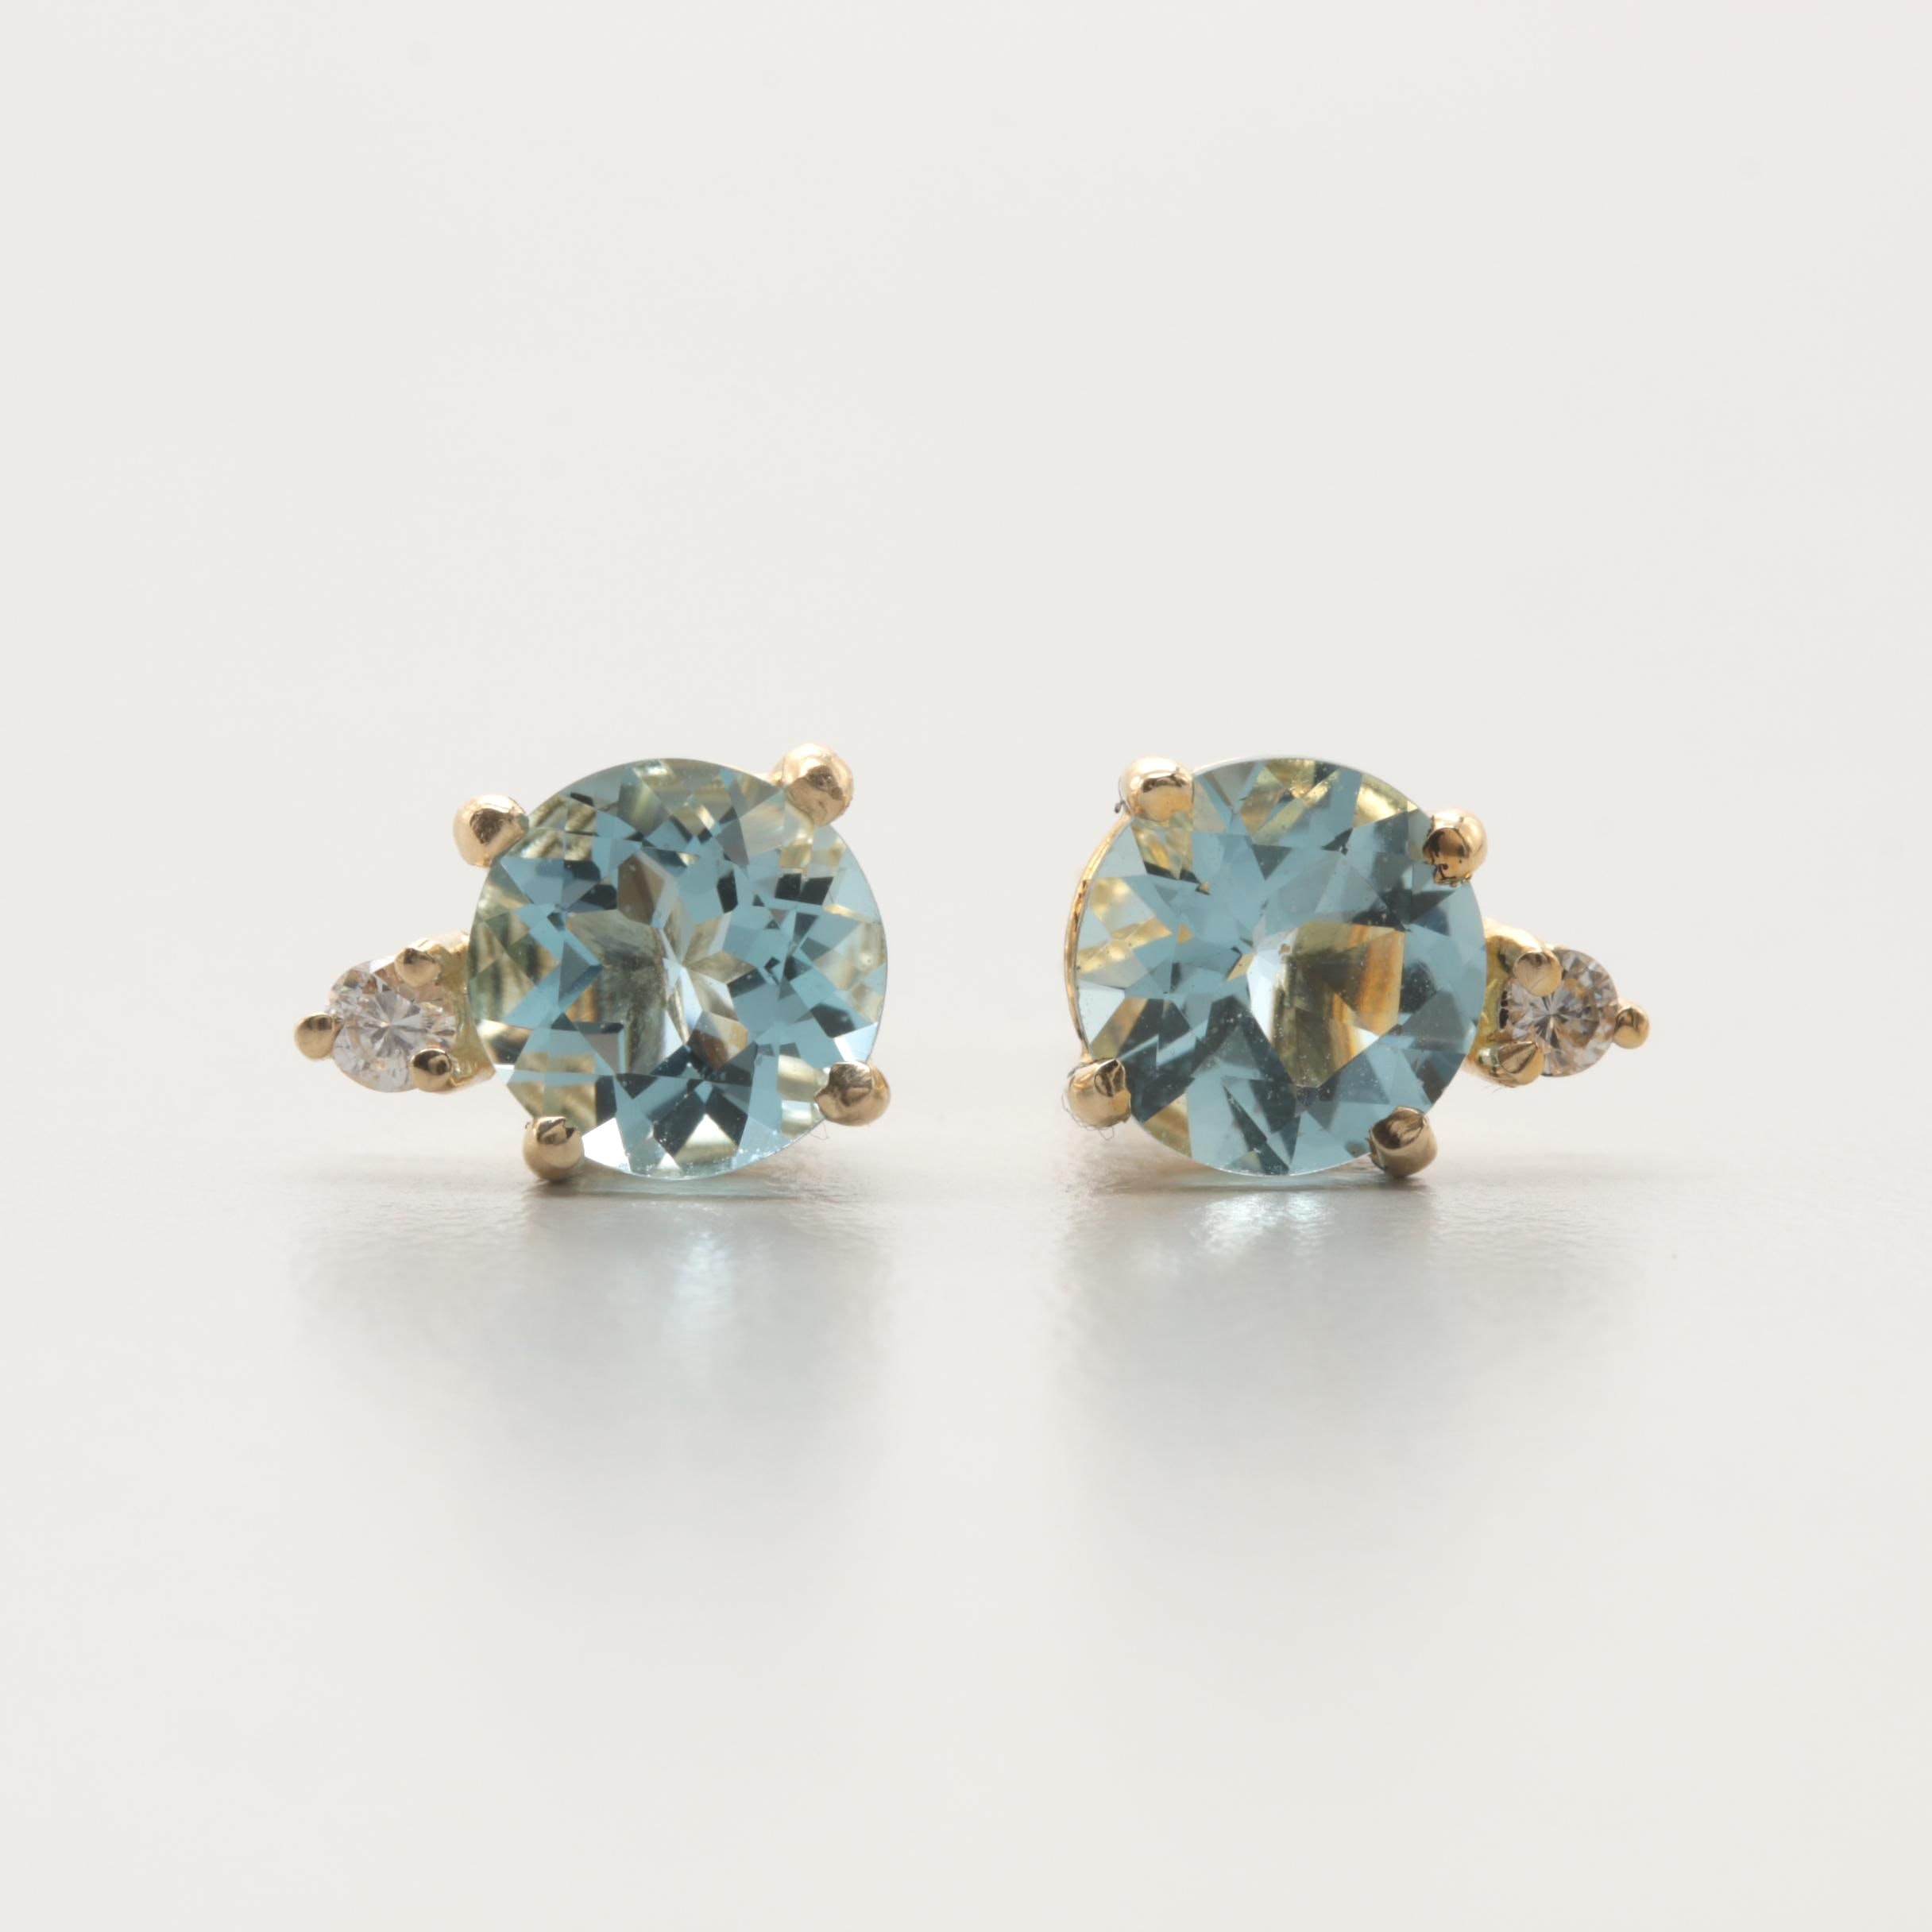 14K Yellow Gold Aquamarine and Diamond Earrings